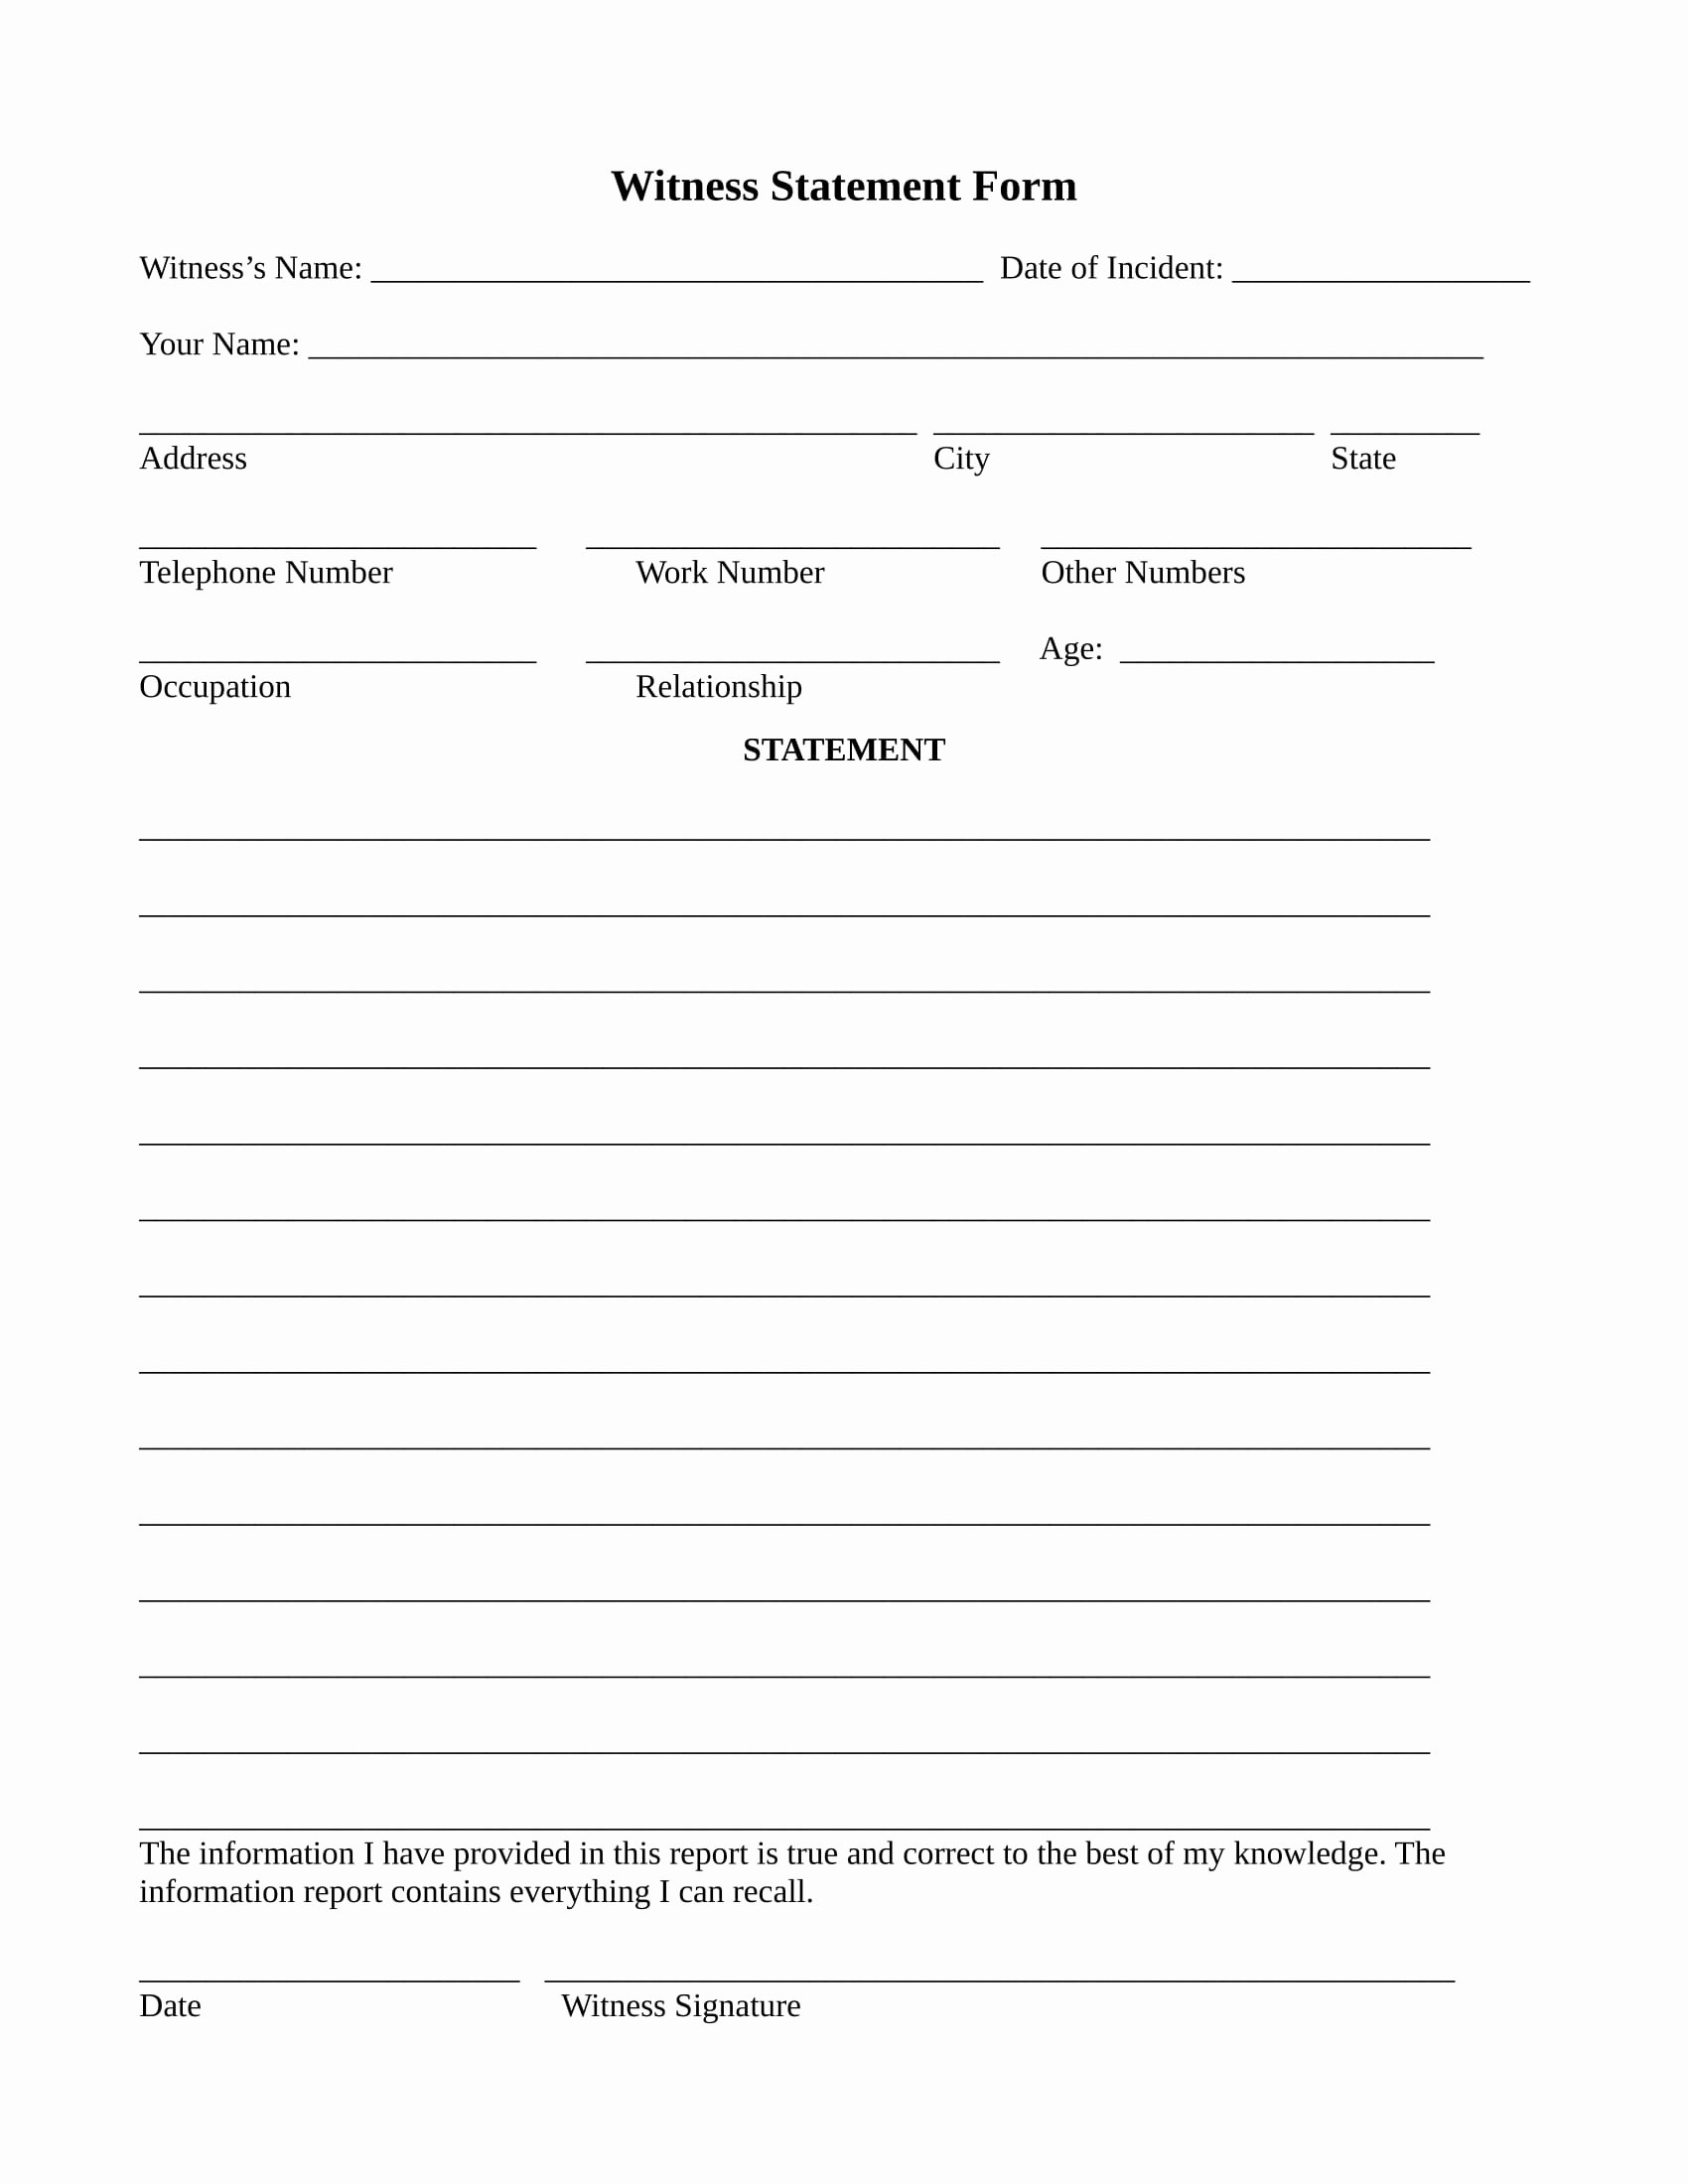 Sample Witness Statement form Elegant Free 14 Employee Witness Statement forms In Word